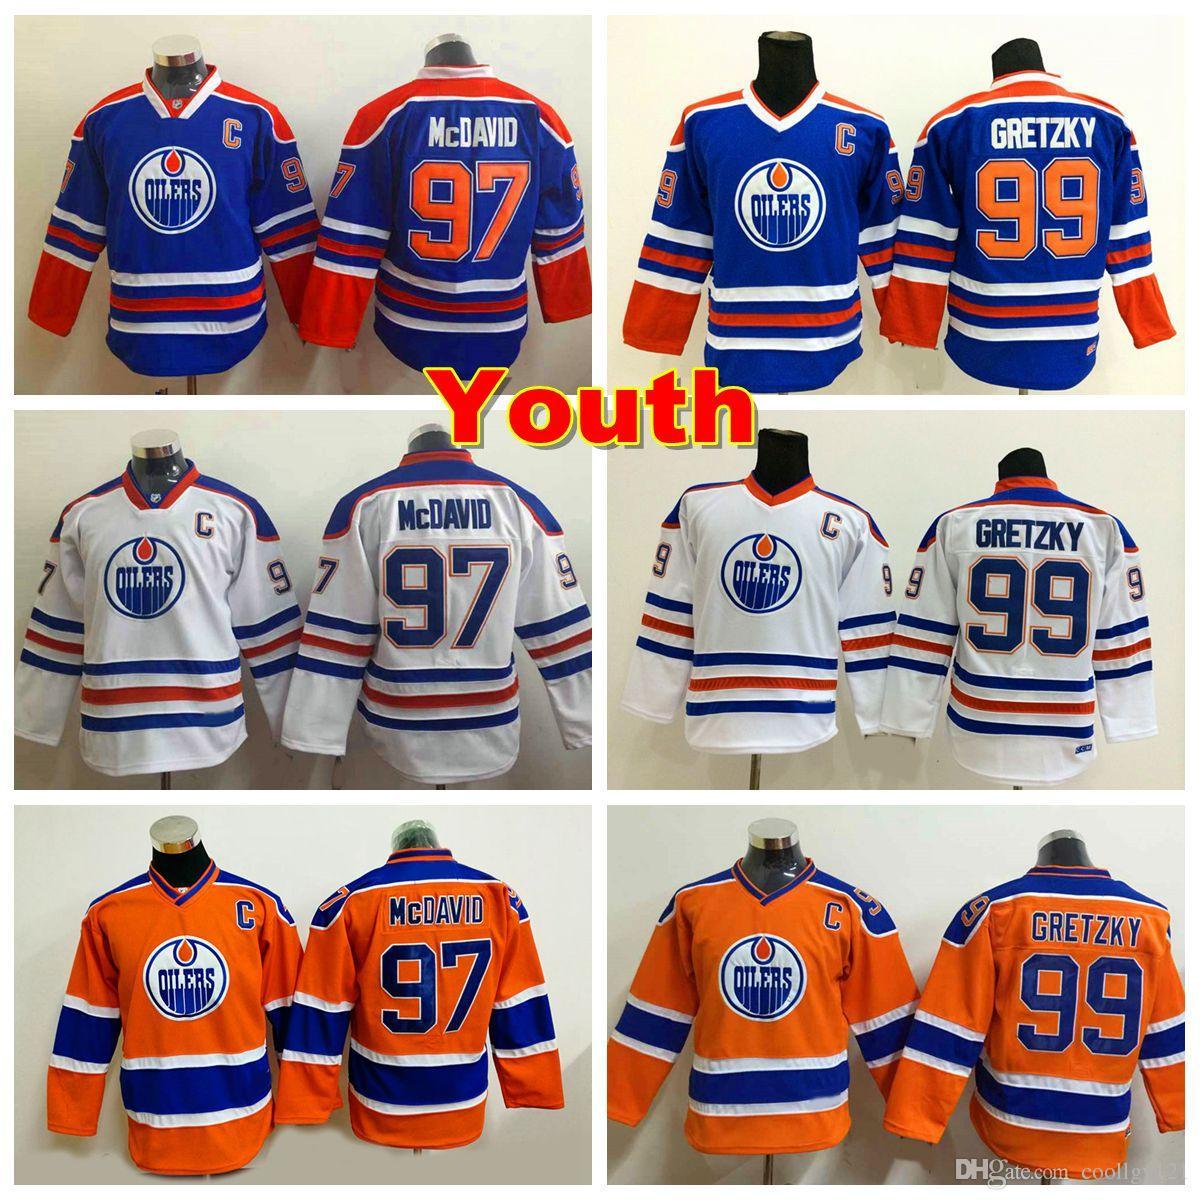 best deals on efe0c f2666 youth edmonton oilers 99 wayne gretzky 2015 orange ccm ...